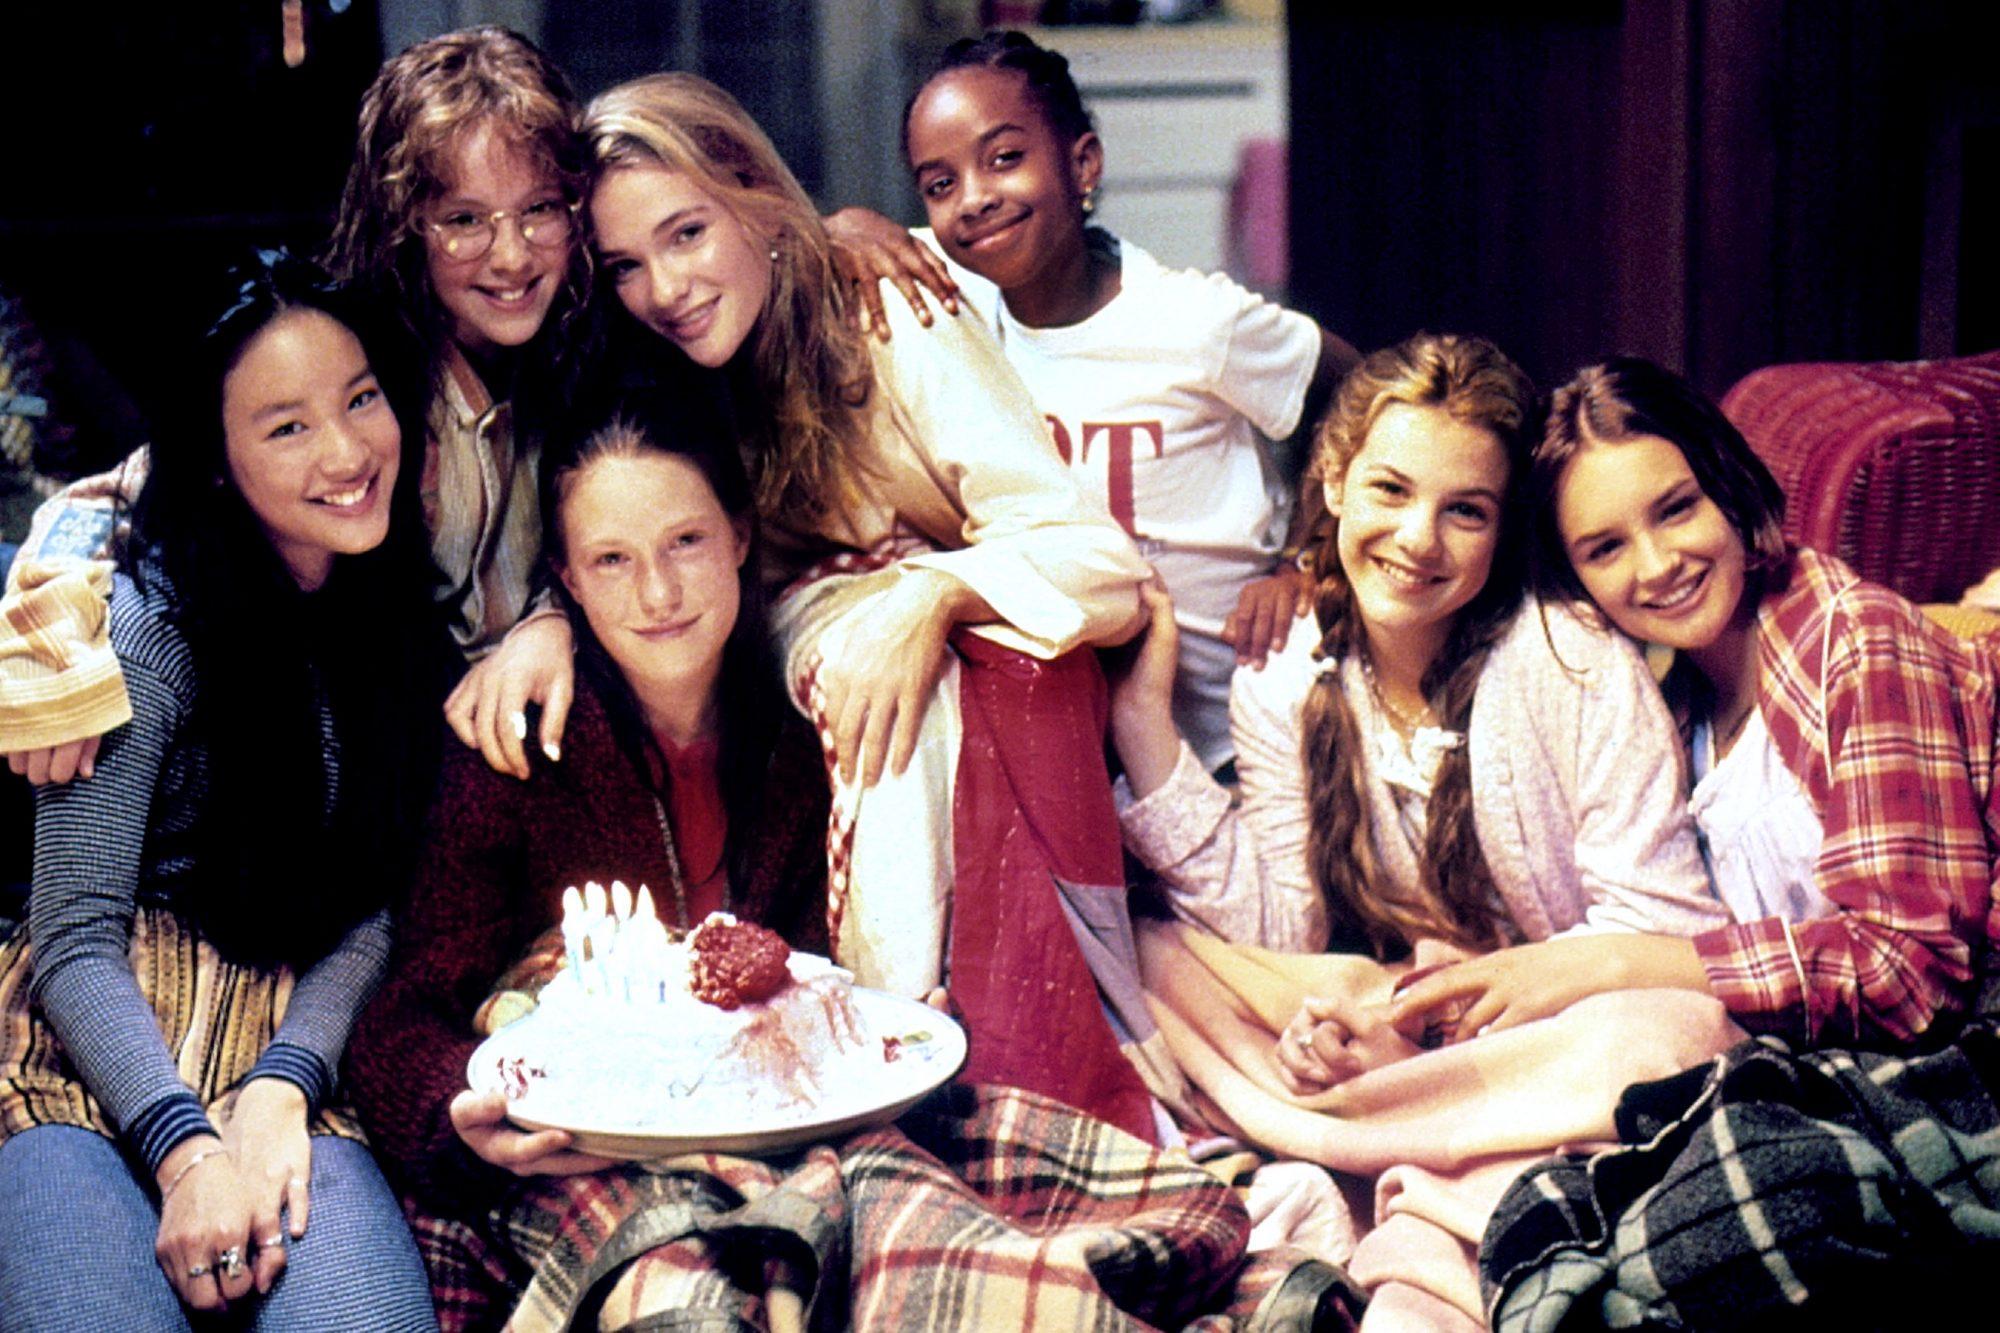 BABY-SITTERS CLUB, Tricia Joe, Stacy Linn Ramsower, Schuyler Fisk, Bre Blair, Zelda Harris, Larisa O